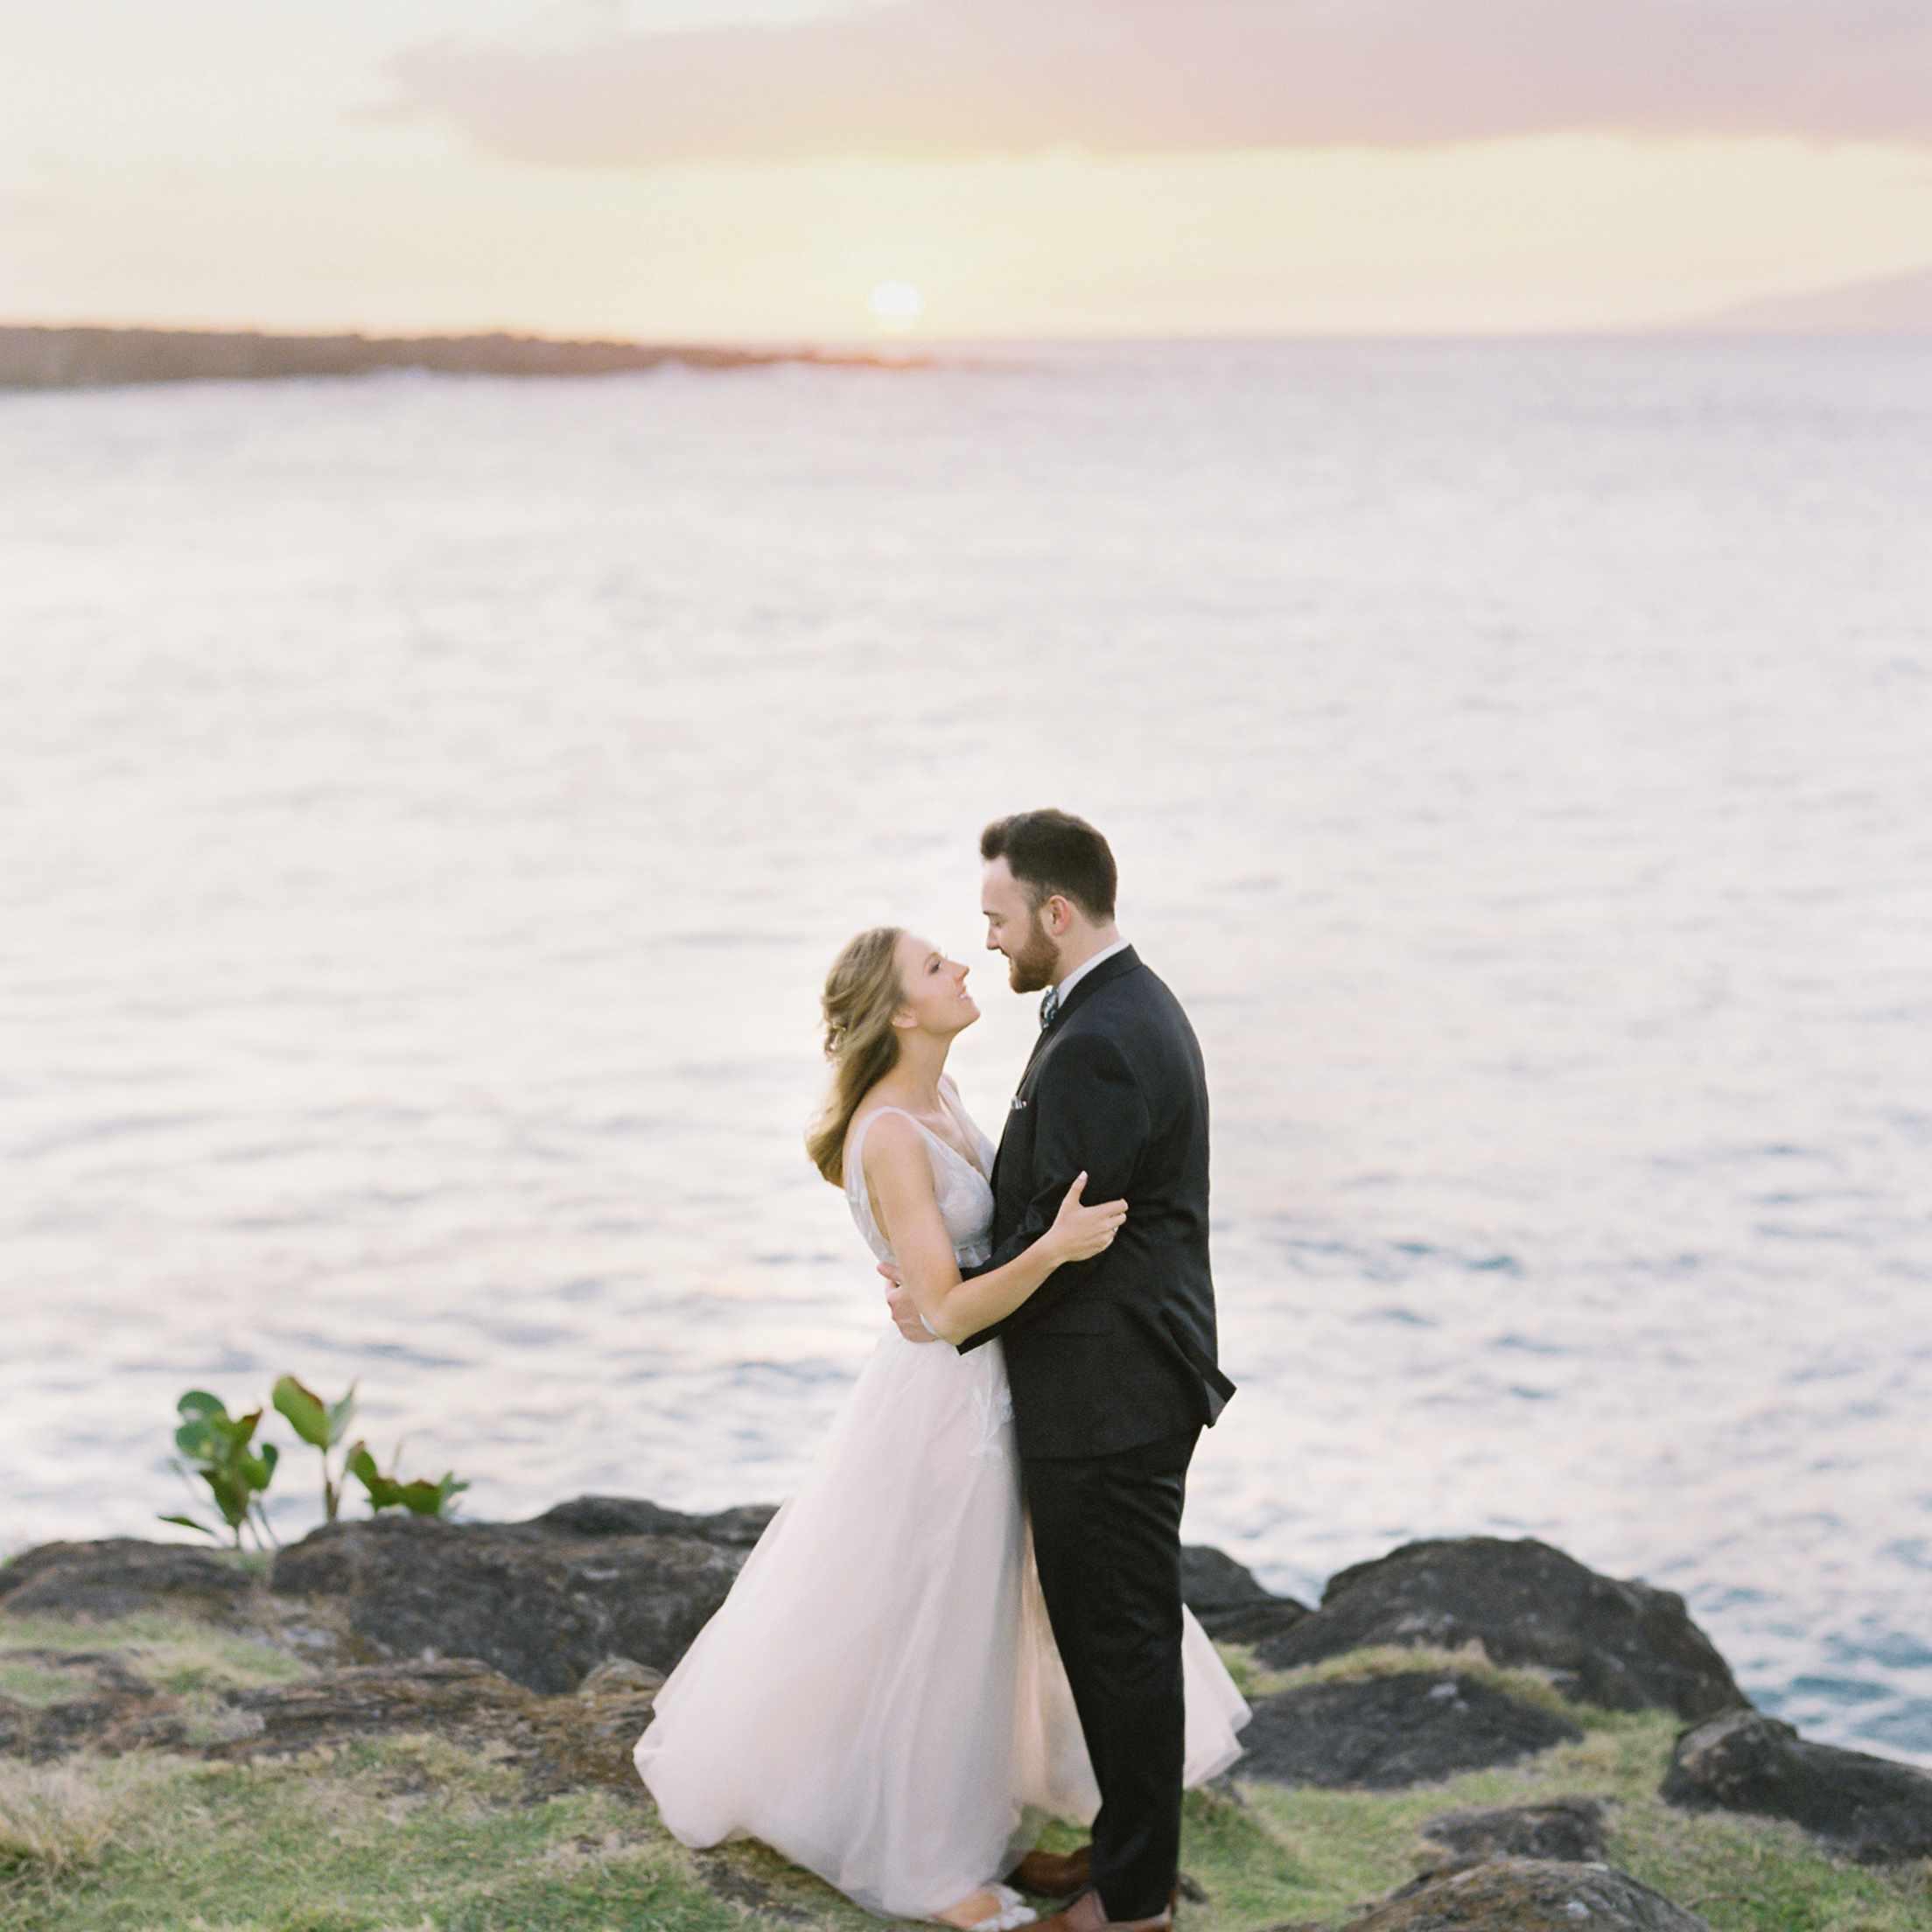 tropical maui wedding, bride and groom embracing sunset